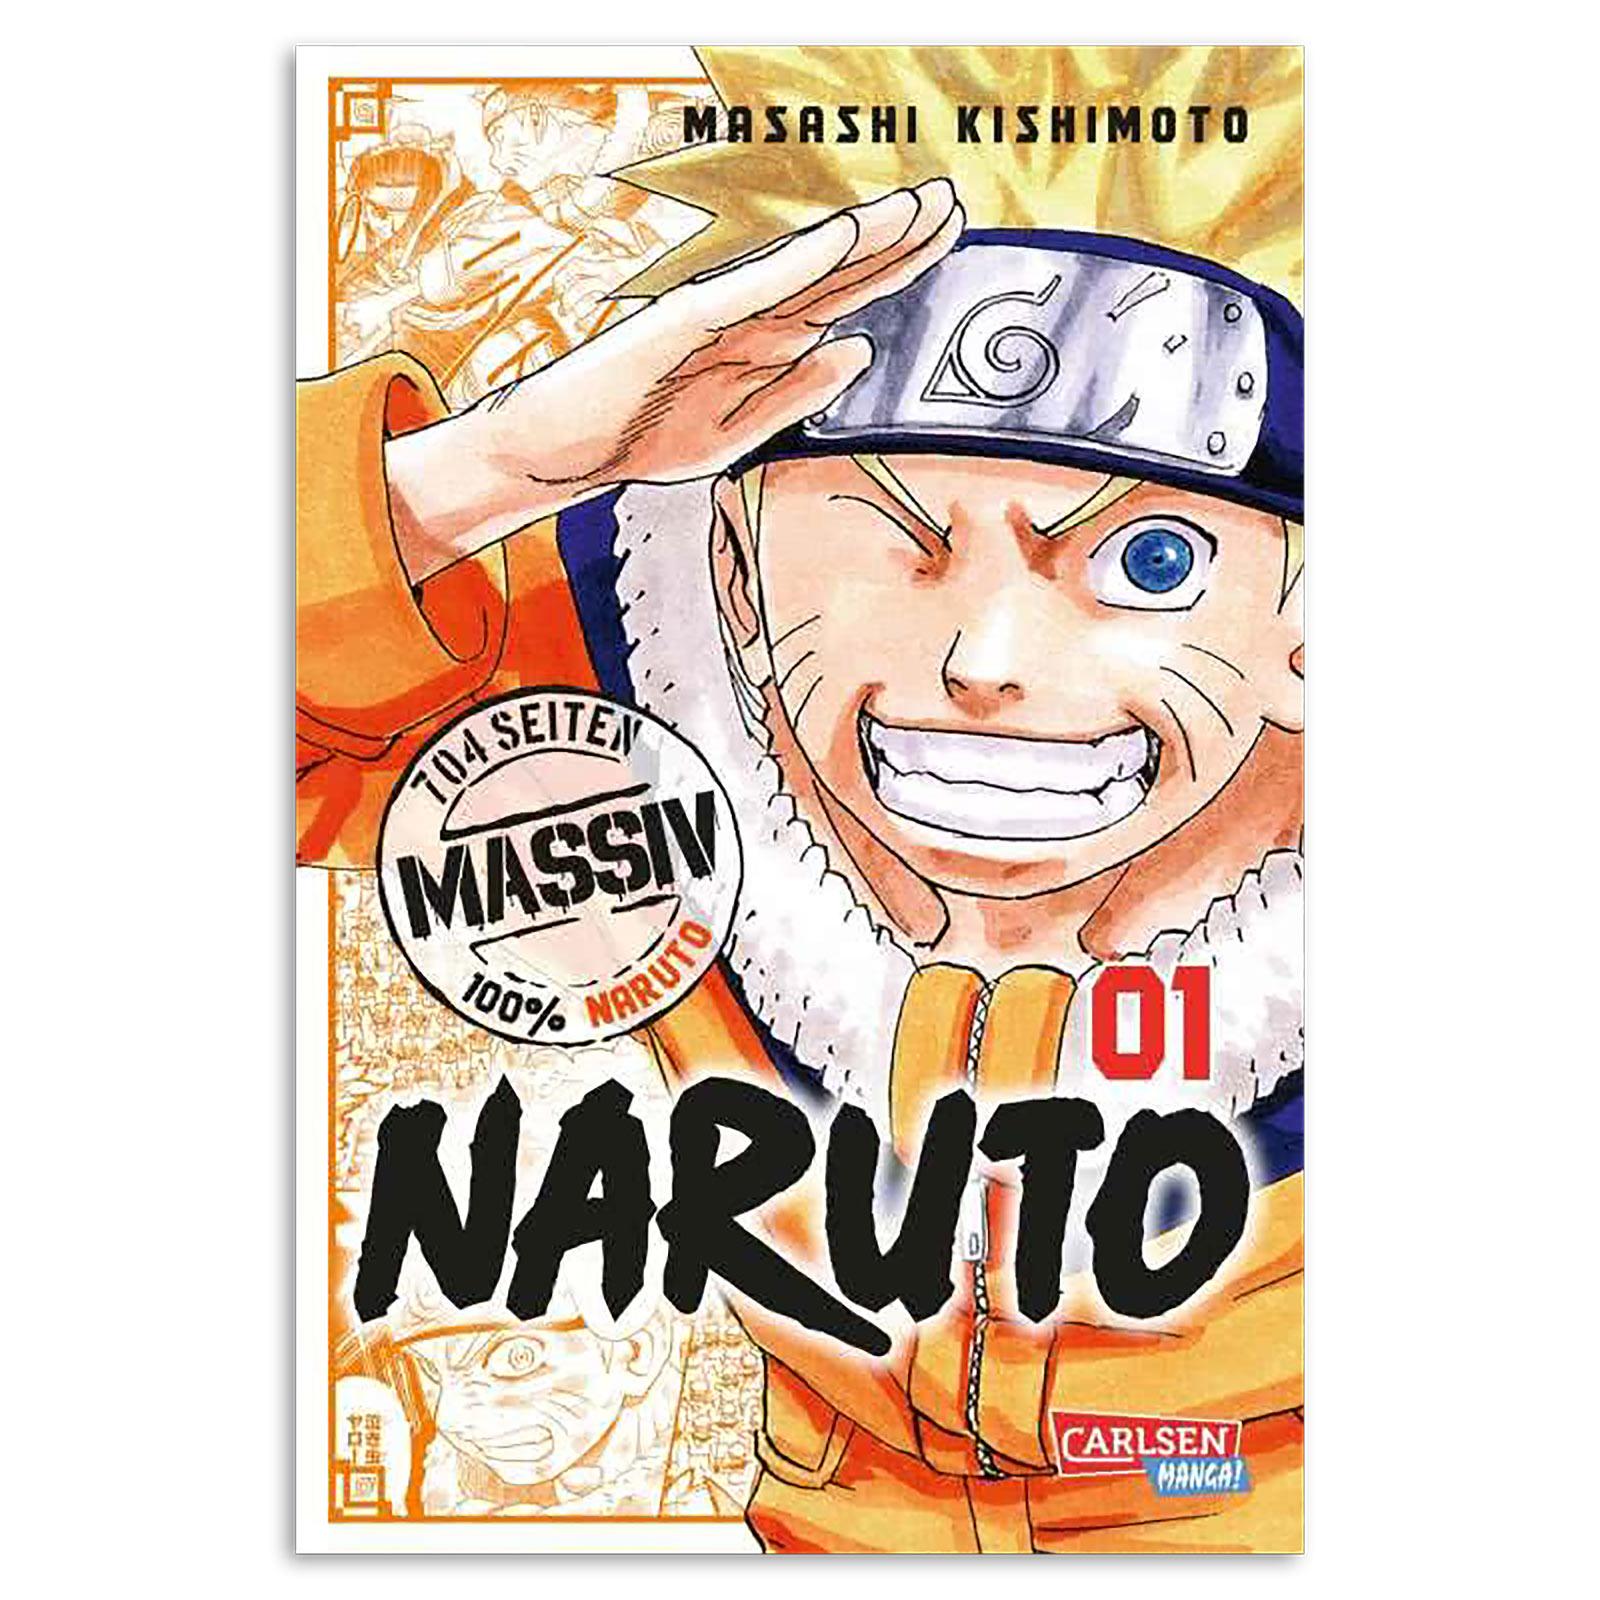 Naruto - Sammelband 1 Taschenbuch